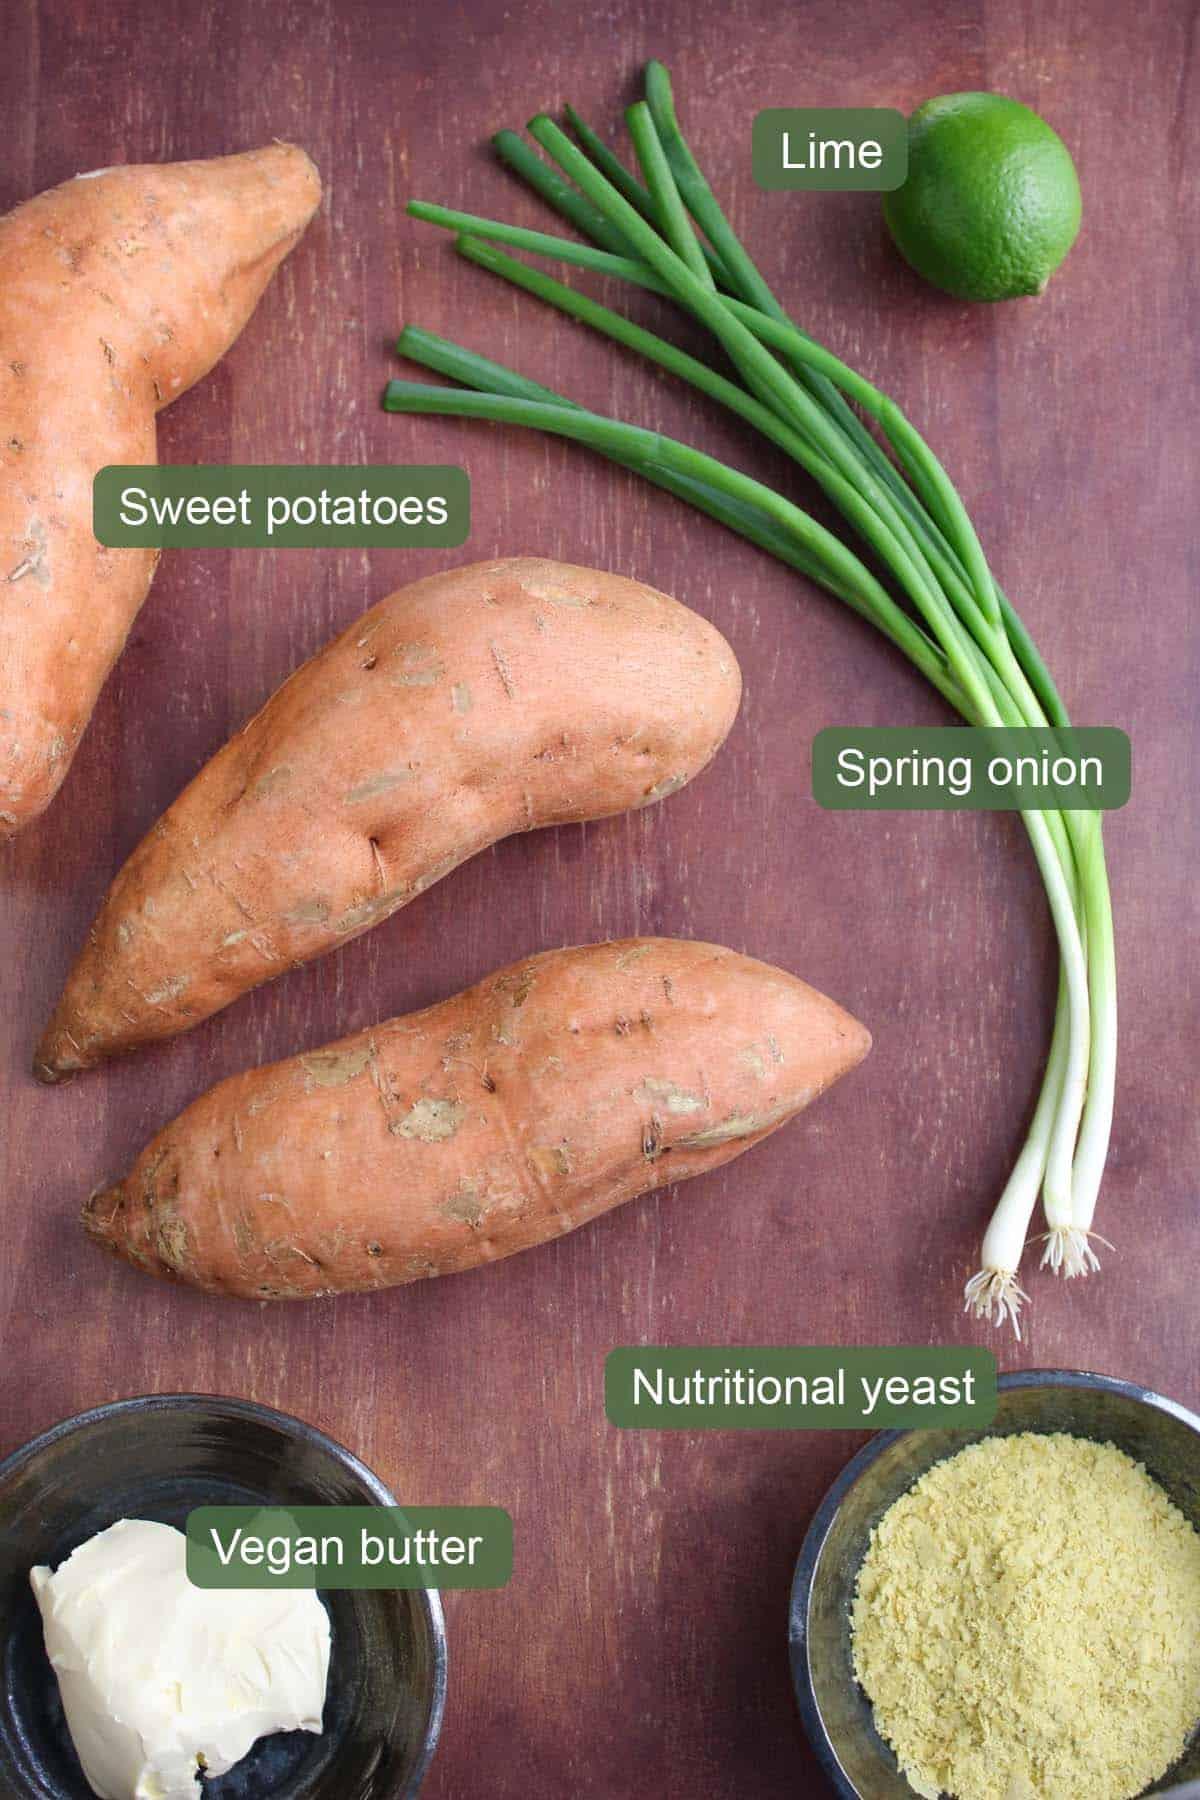 List of Ingredients to Make Mashed Sweet Potato